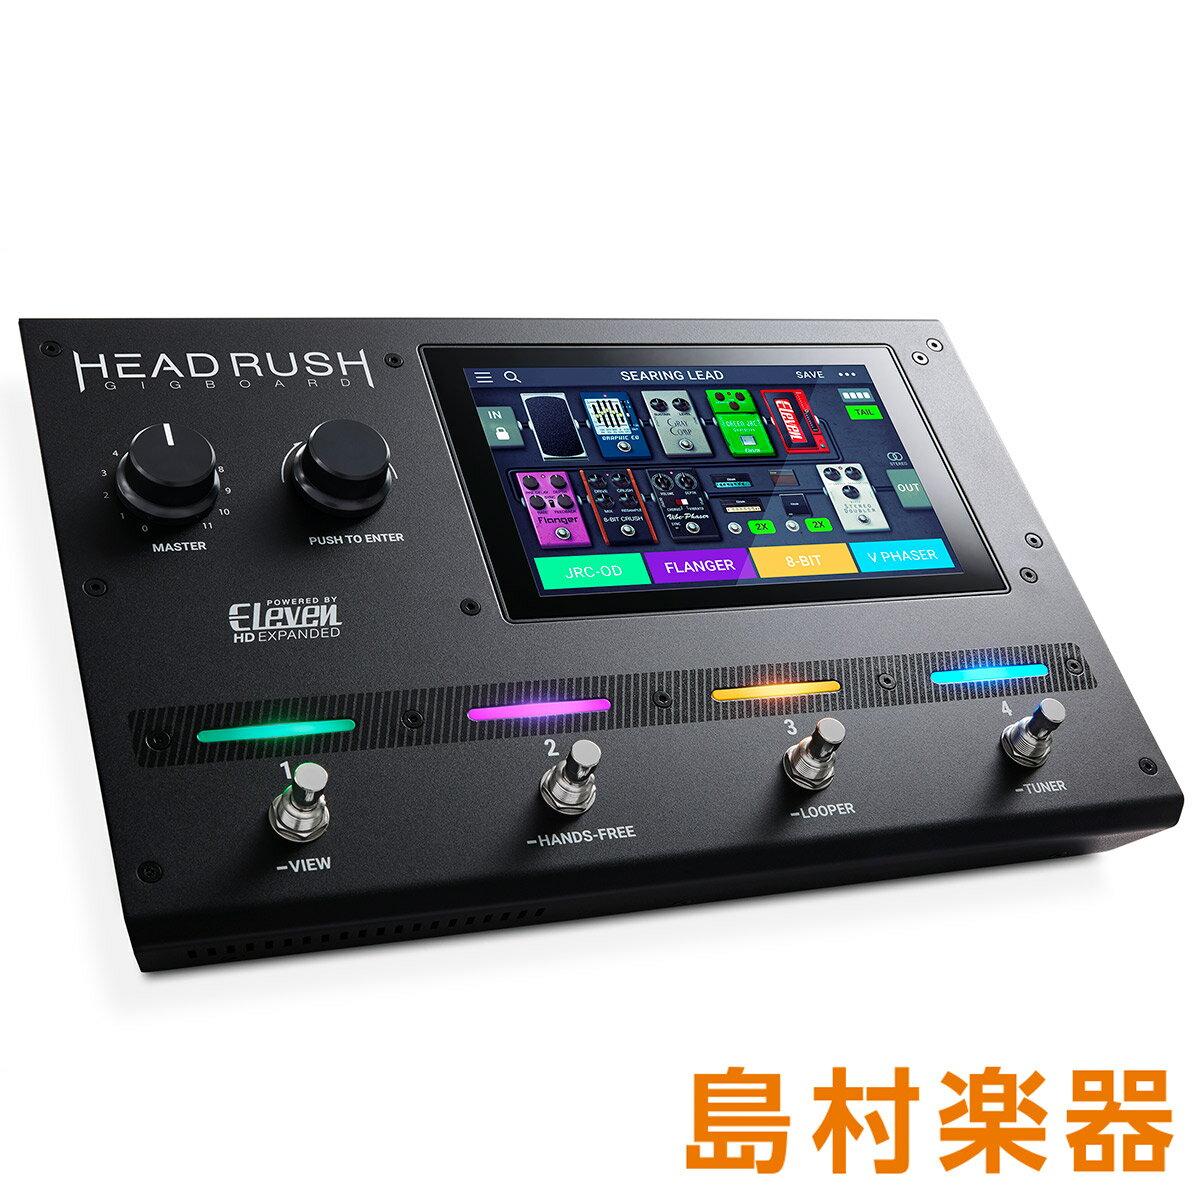 HEADRUSH Gigboard アンプモデリングプロセッサー 【ヘッドラッシュ】